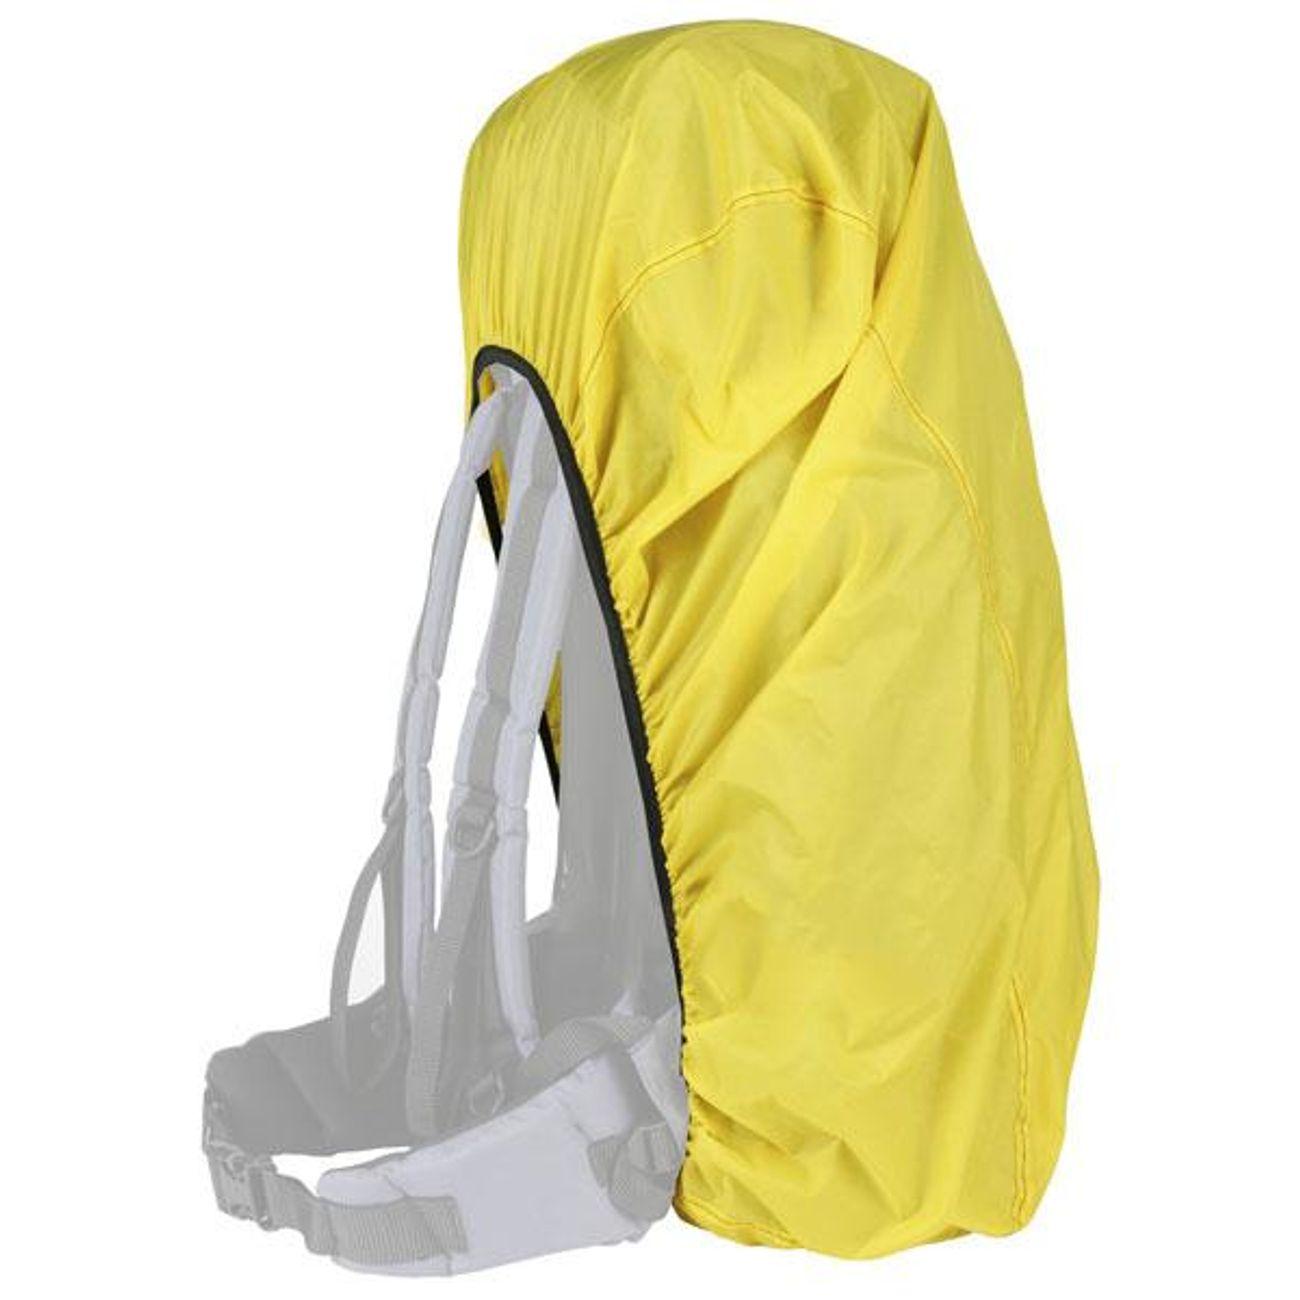 ferrino waterproof backpack cover achat et prix pas cher go sport. Black Bedroom Furniture Sets. Home Design Ideas